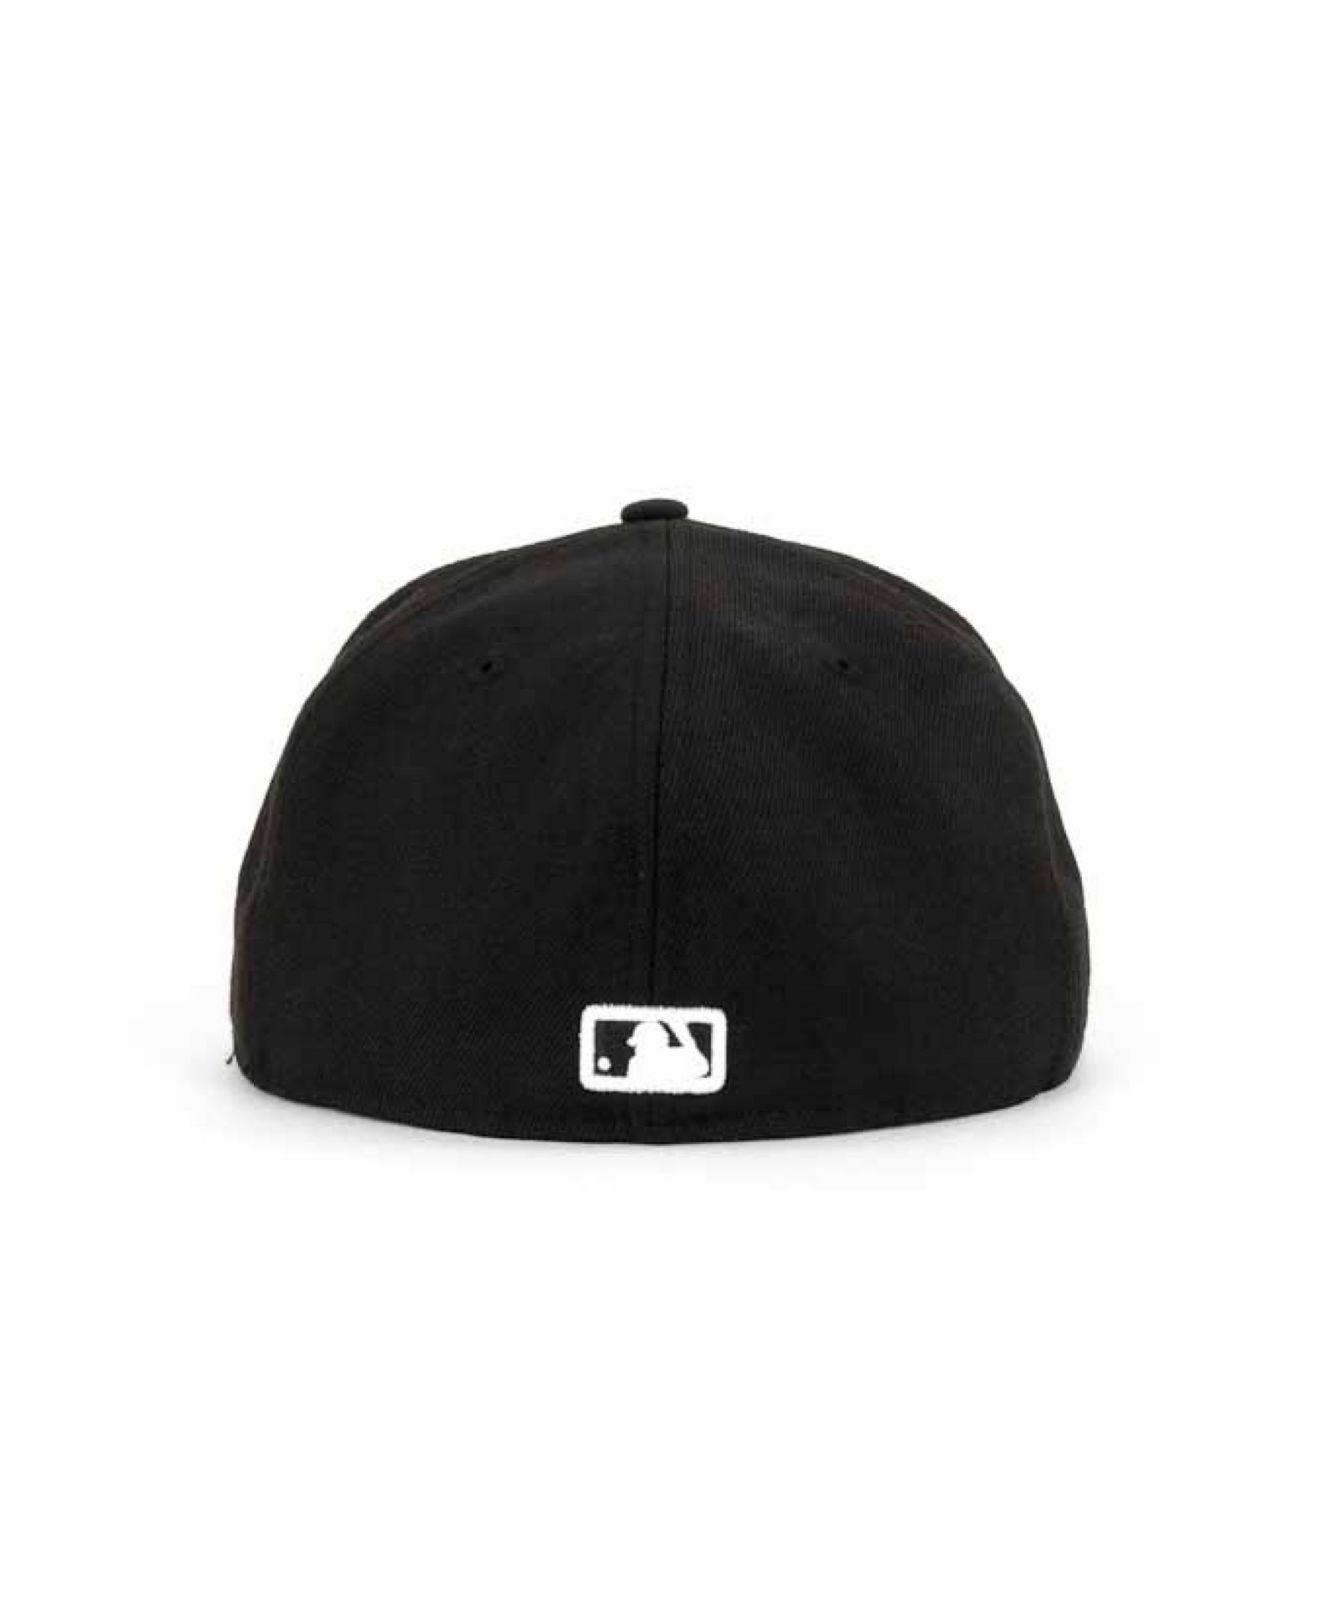 e4f6d841df0 KTZ - Milwaukee Brewers Mlb Black And White Fashion 59fifty Cap for Men -  Lyst. View fullscreen